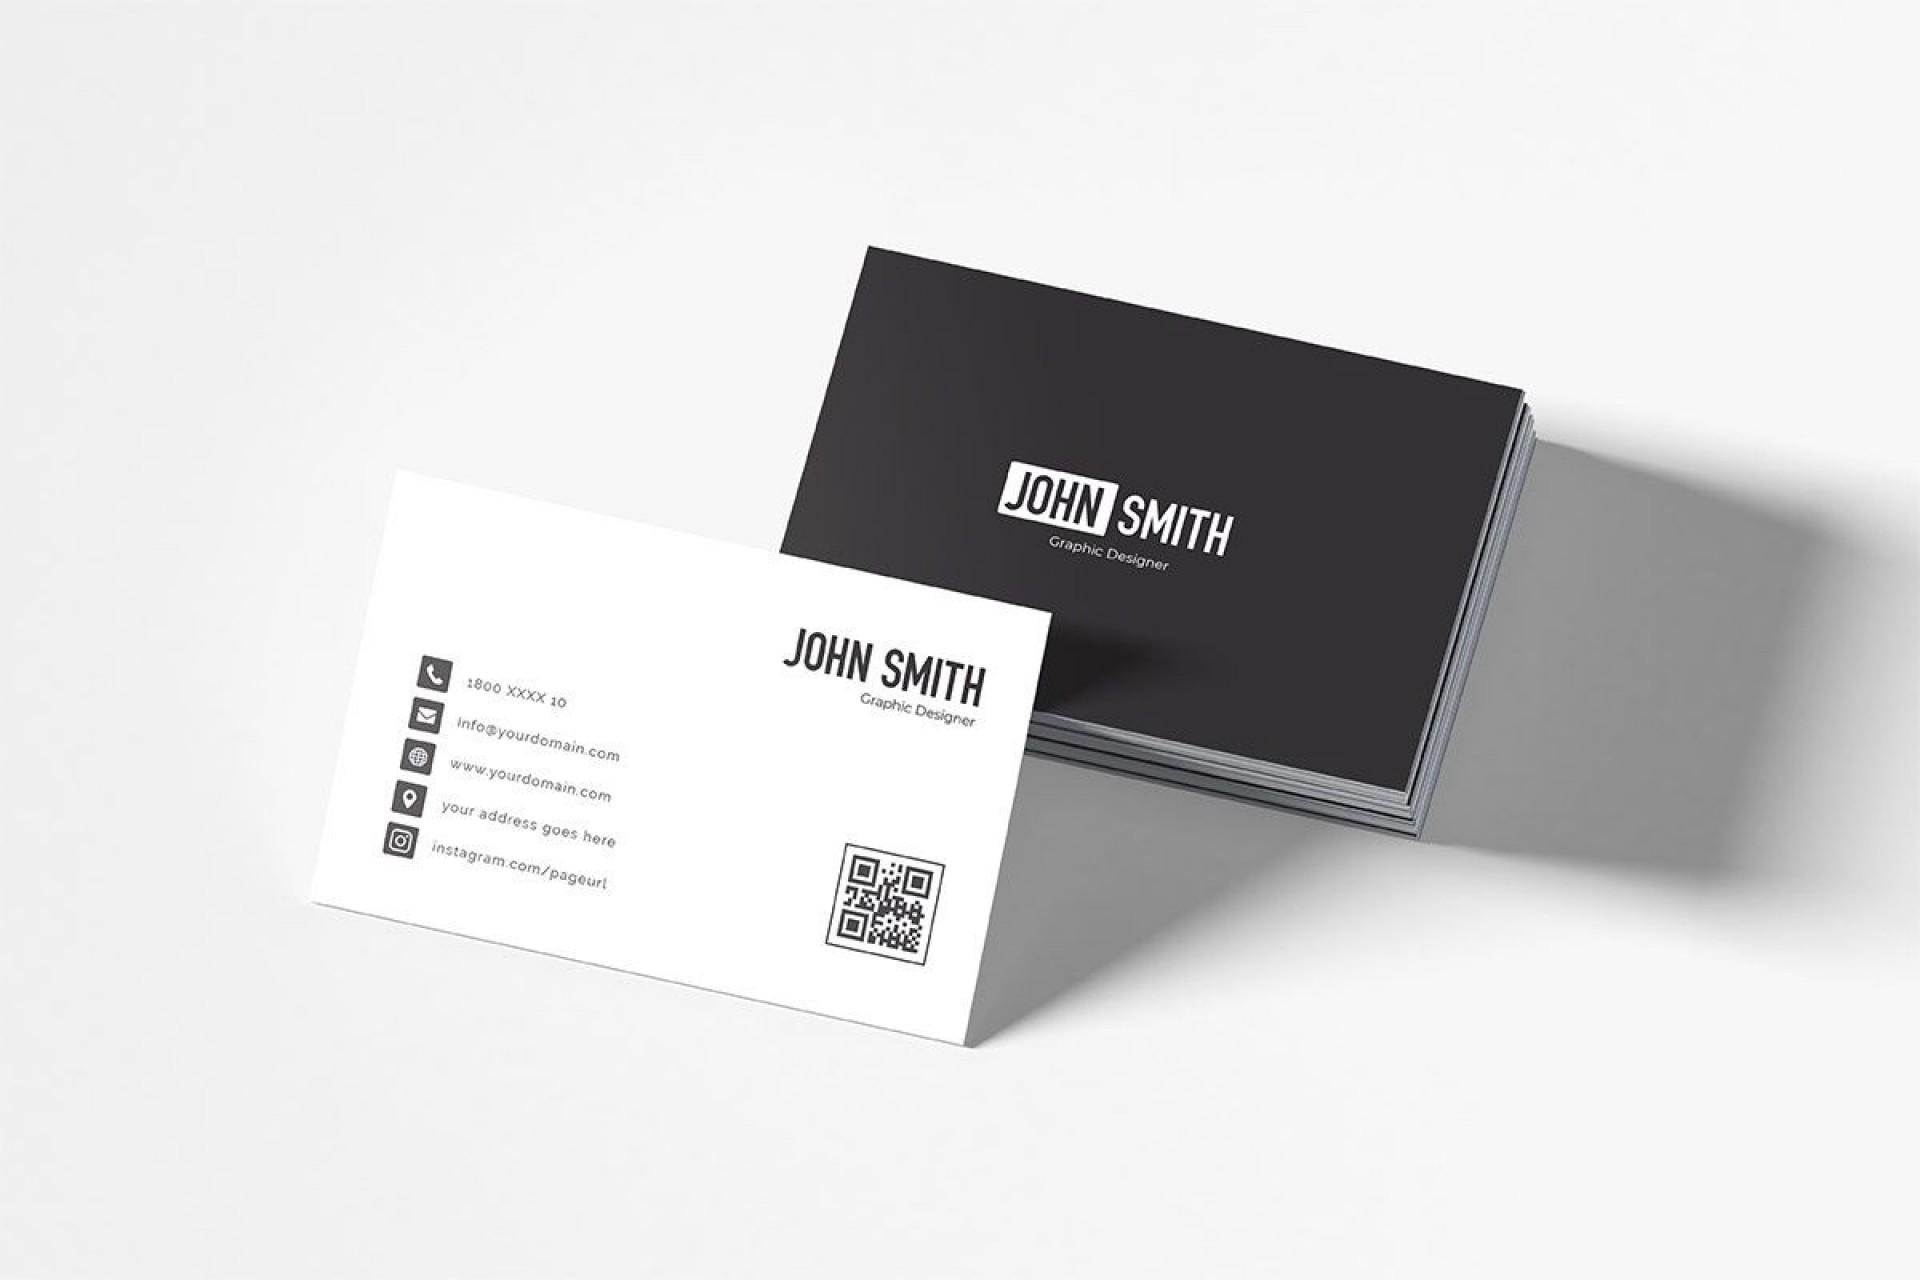 007 Impressive Simple Busines Card Template Free Highest Clarity  Visiting Design Psd File Download Minimalist Basic1920